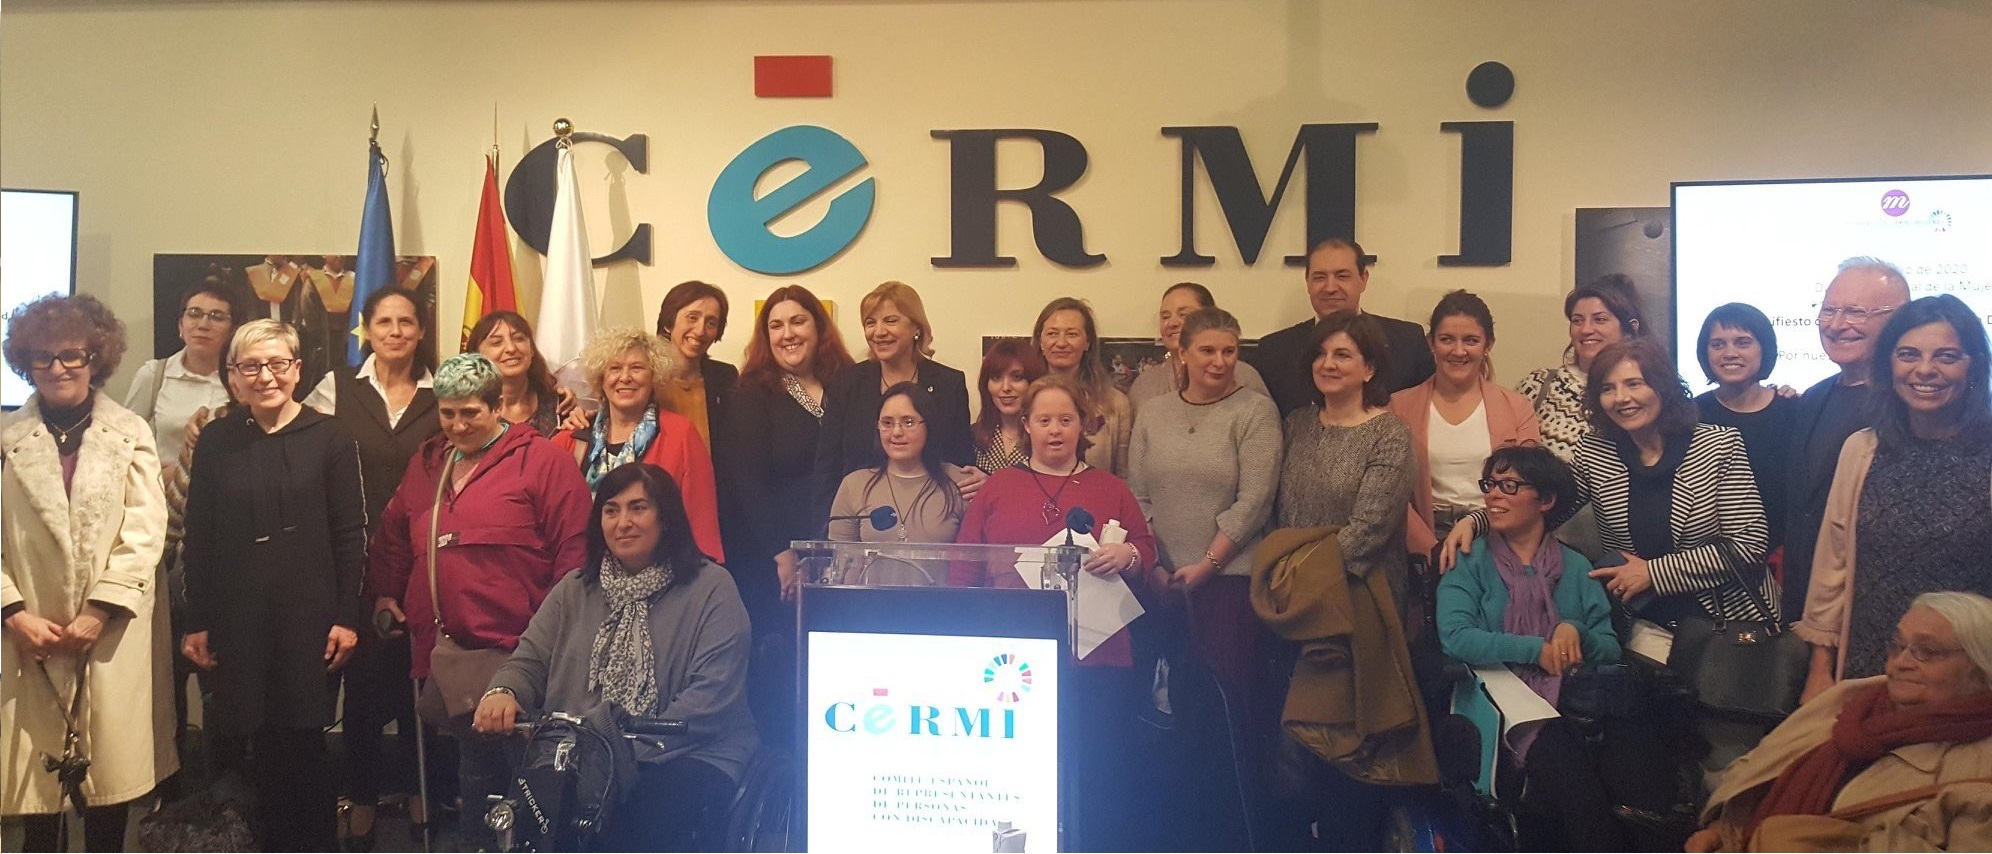 Manifiesto CERMI Mujeres